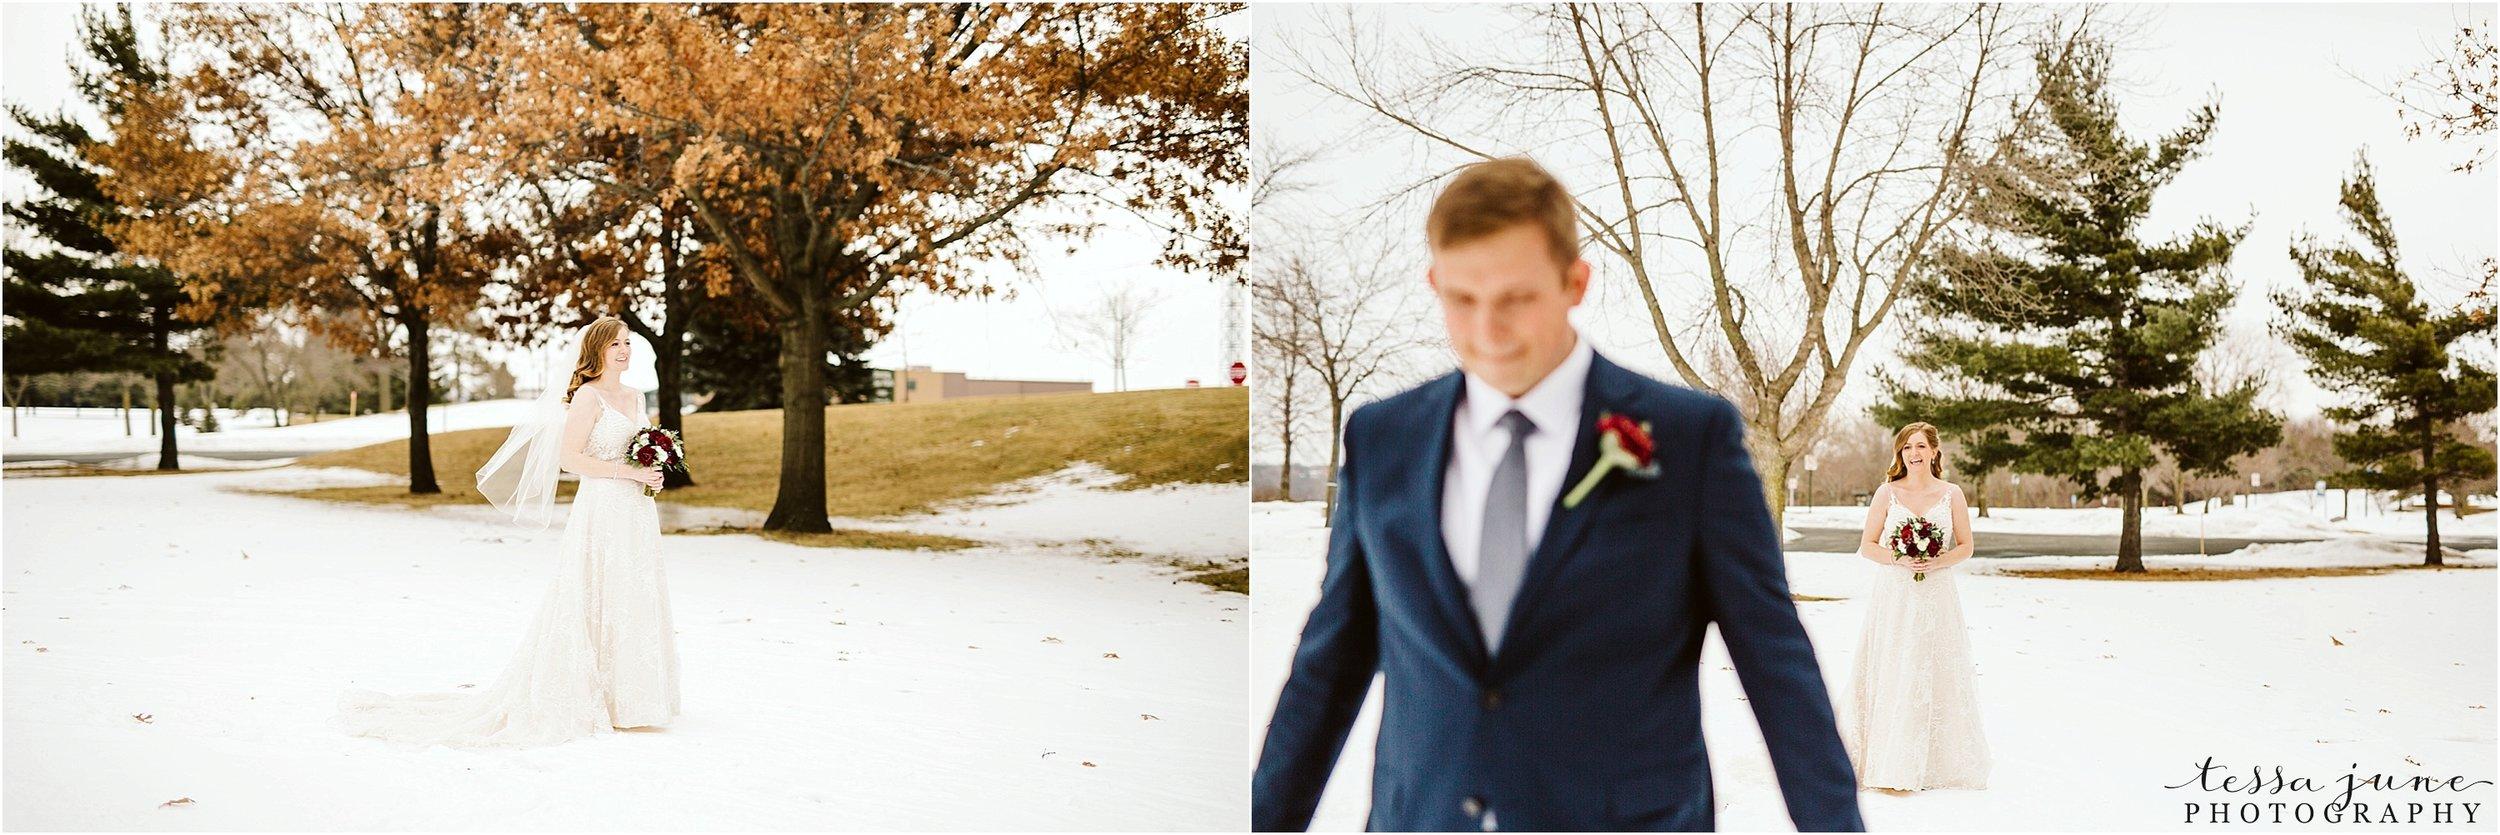 winter-wedding-in-eden-prairie-barn-minnesota-airplane-63.jpg